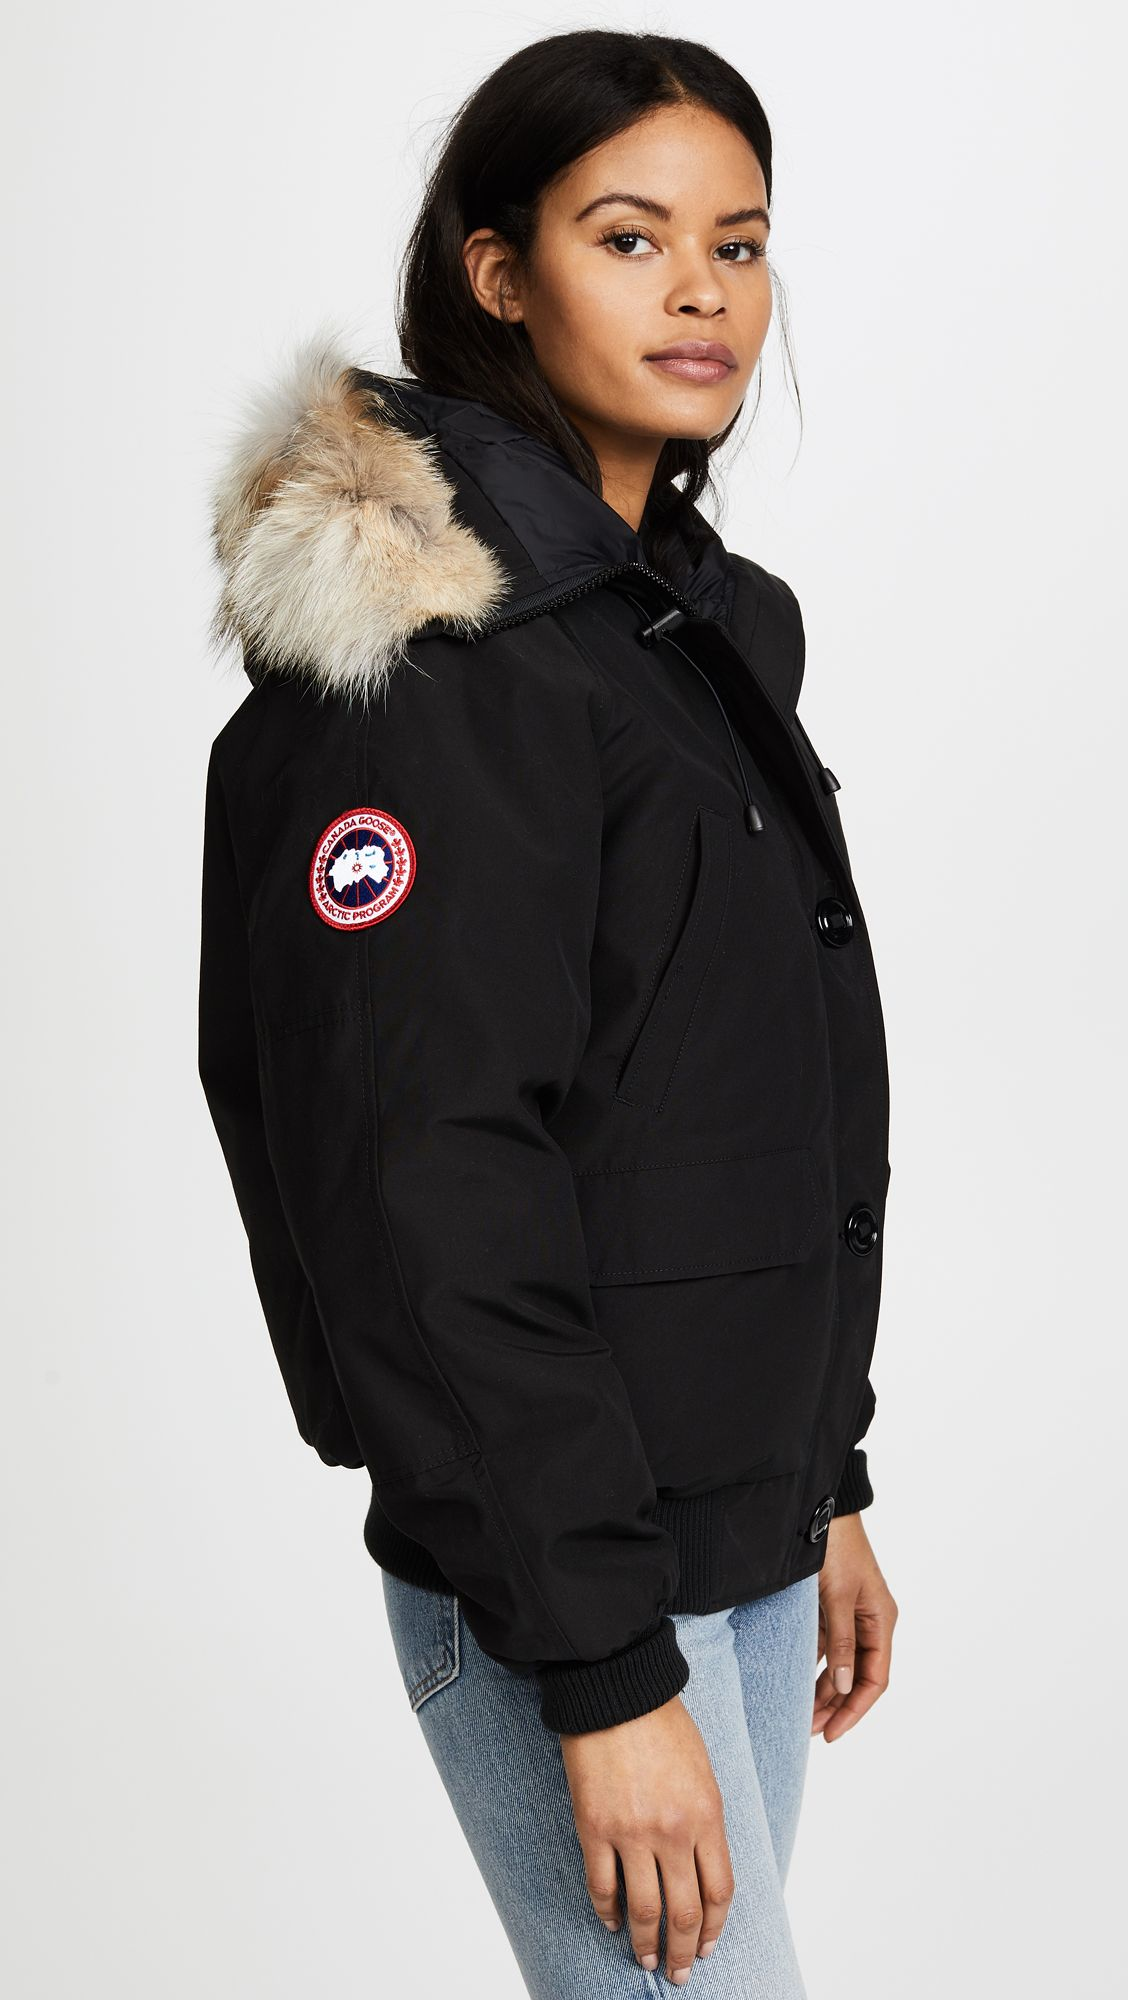 Canada Goose Chilliwack Bomber Shopbop Korean Fashion Casual Canada Goose Jackets Canada Goose Chilliwack